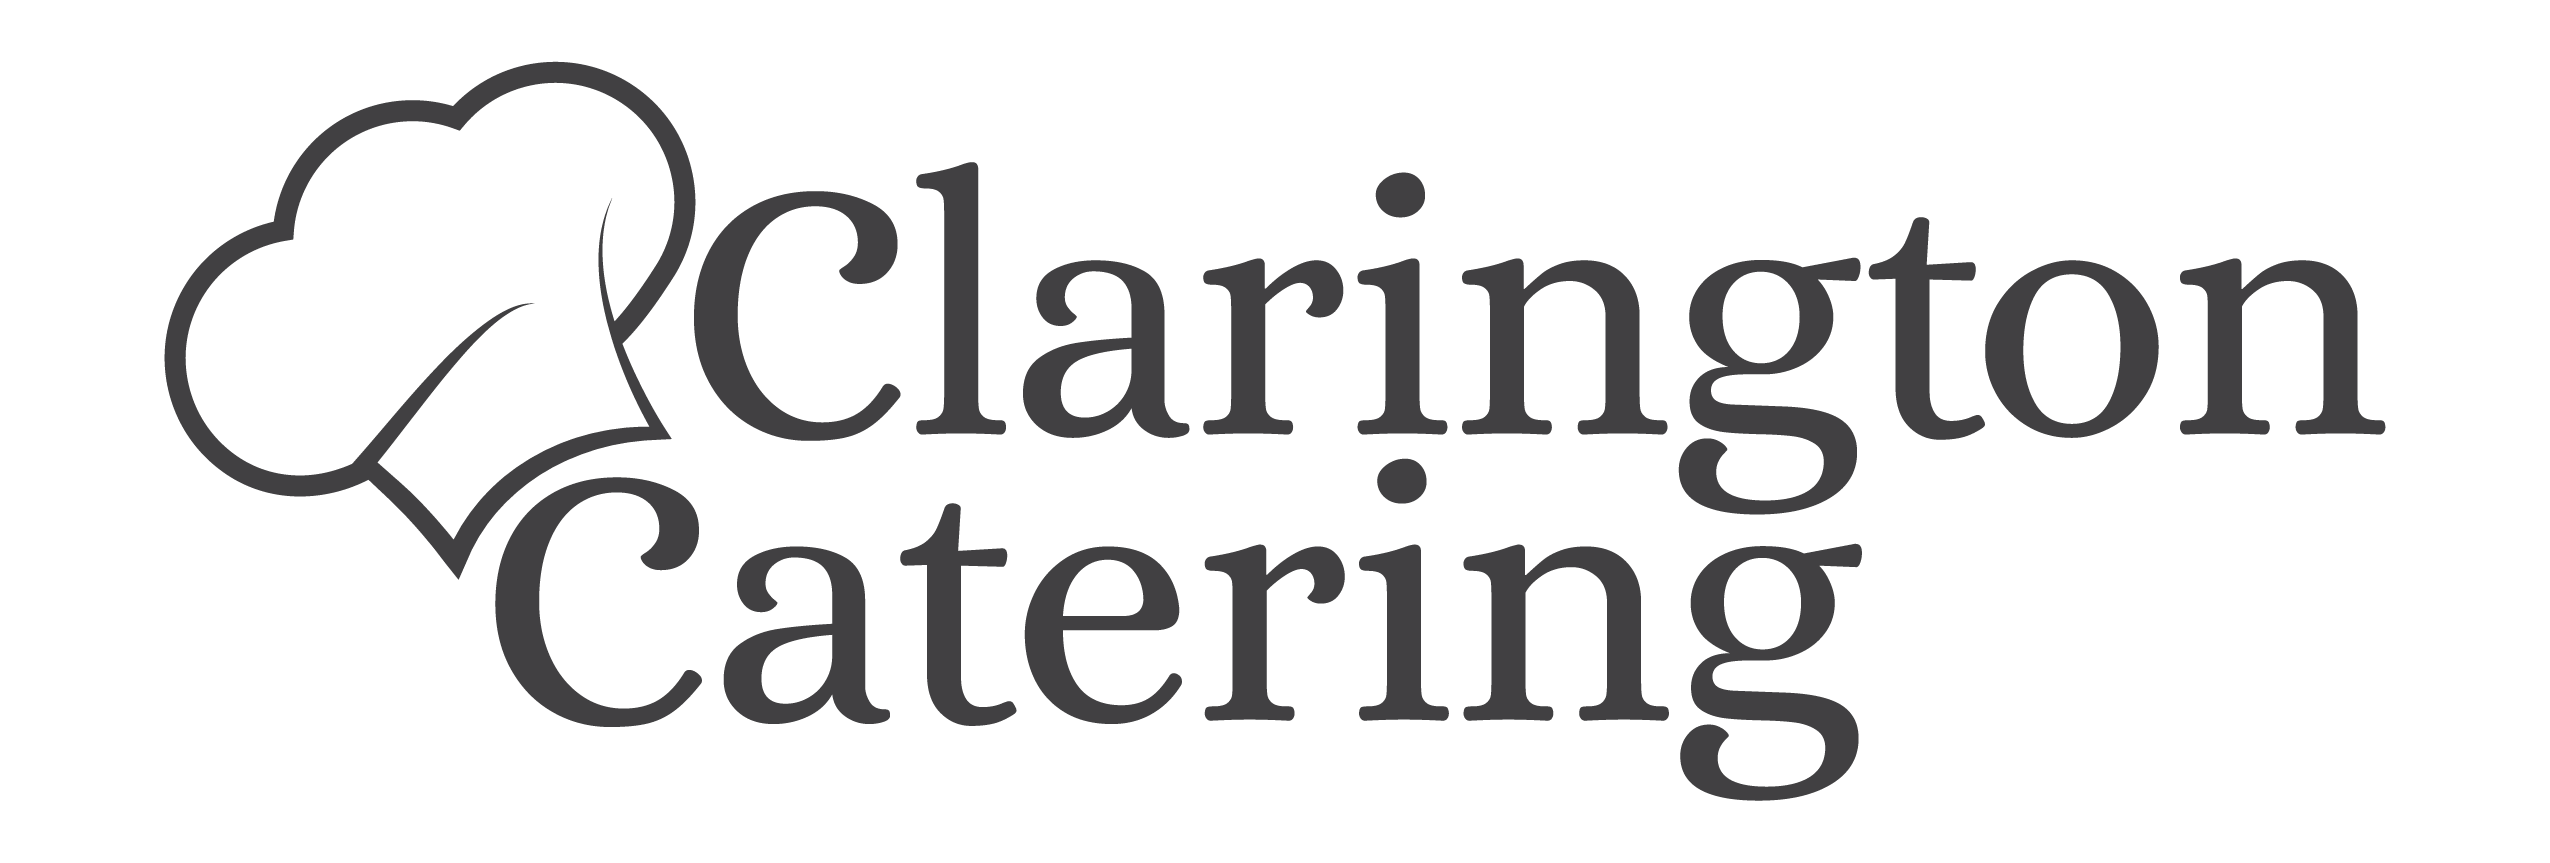 ClaringtonCatering_Logo_Black